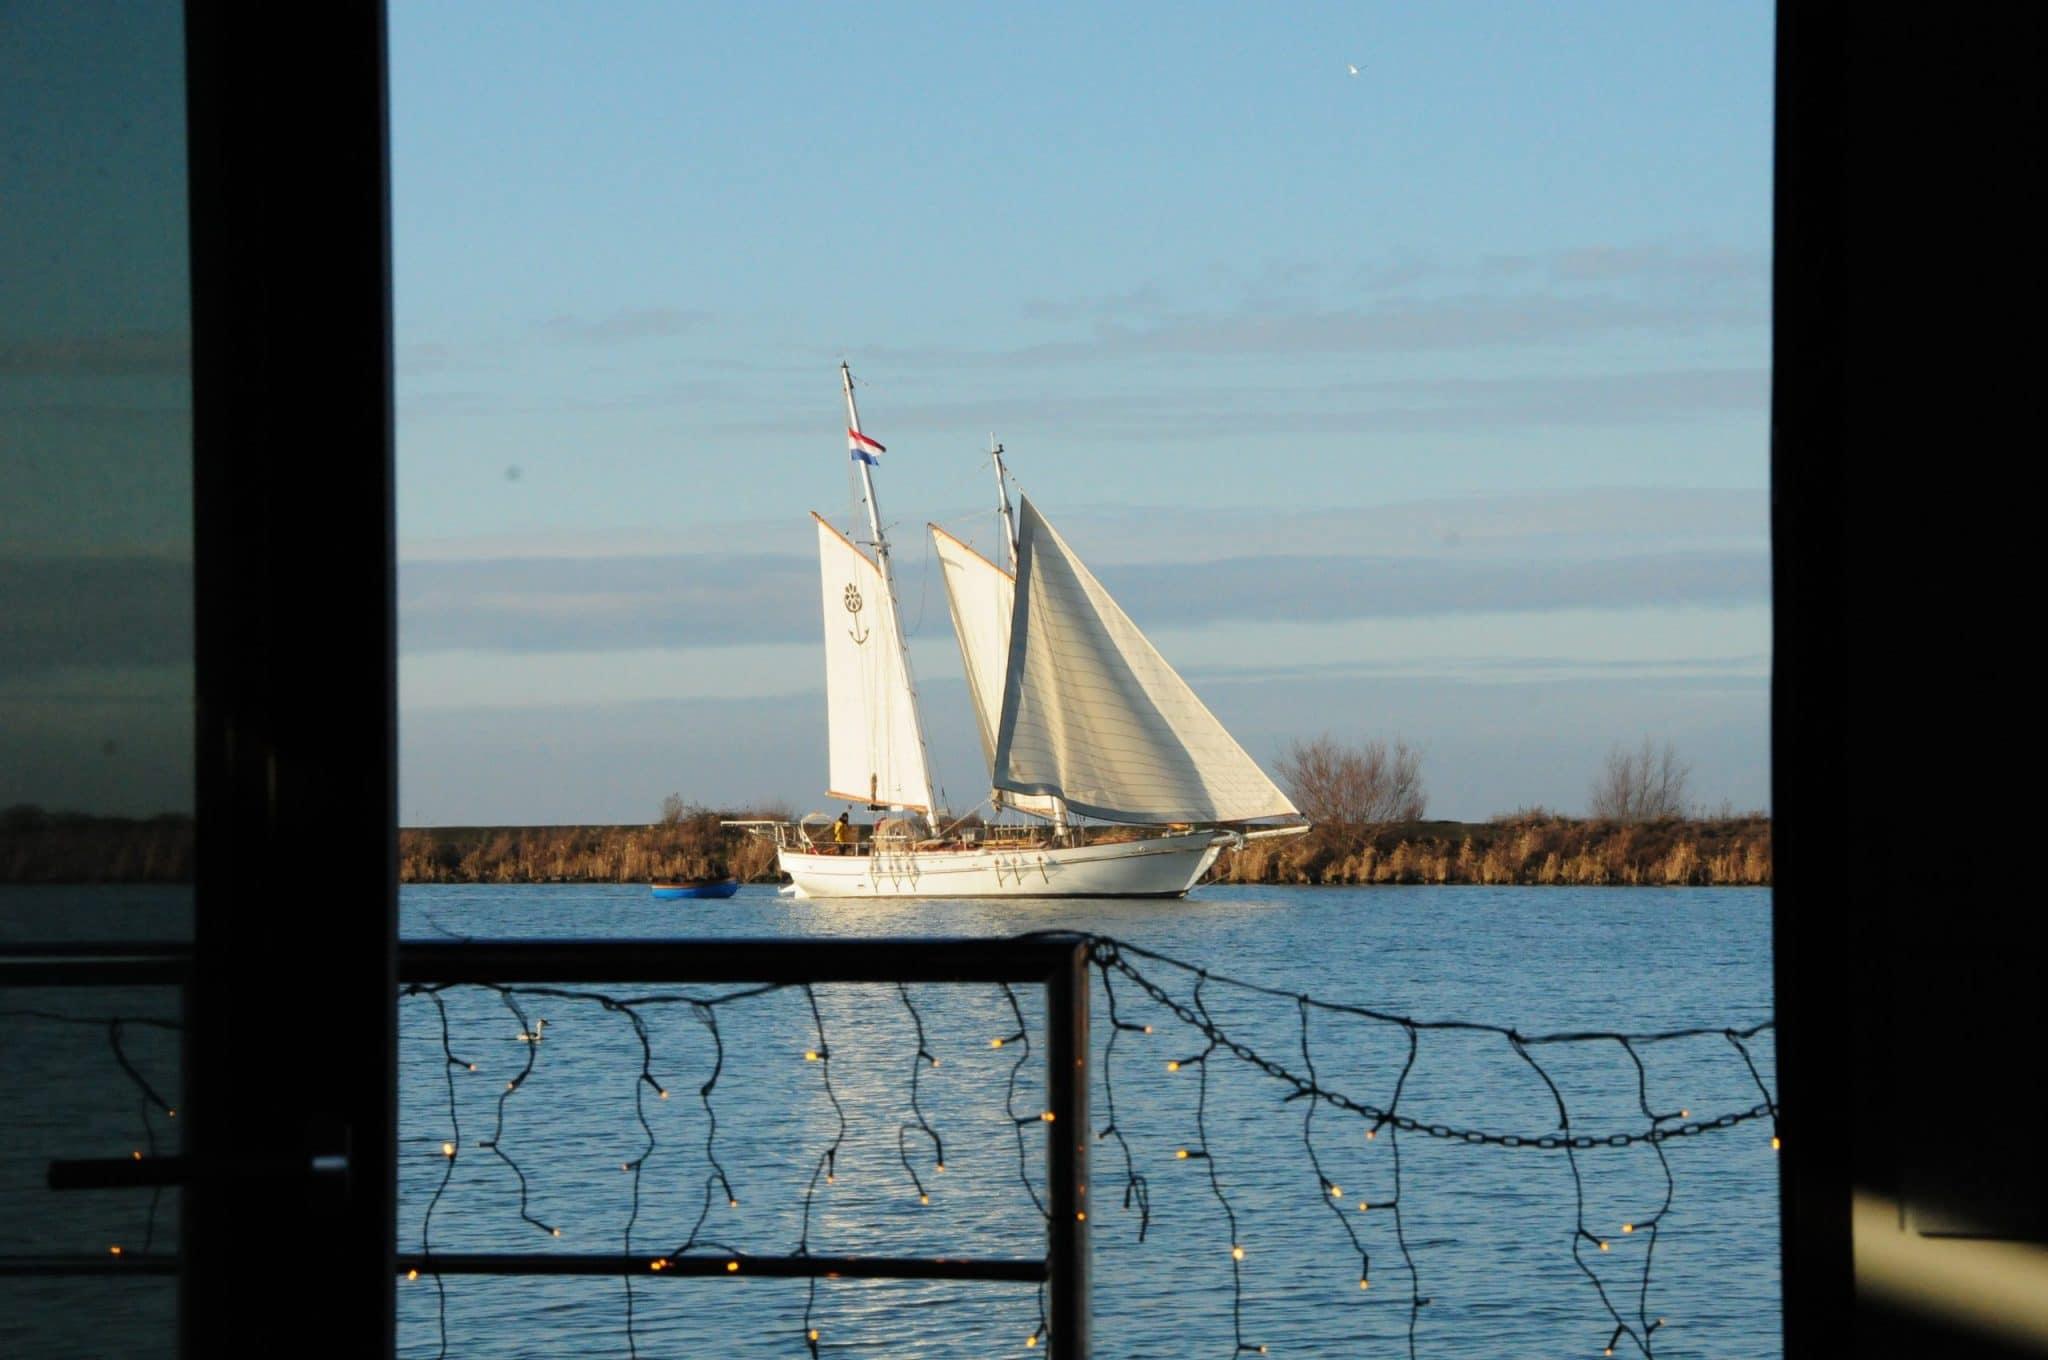 Mermaid-Hausboote_Hafenleben_7